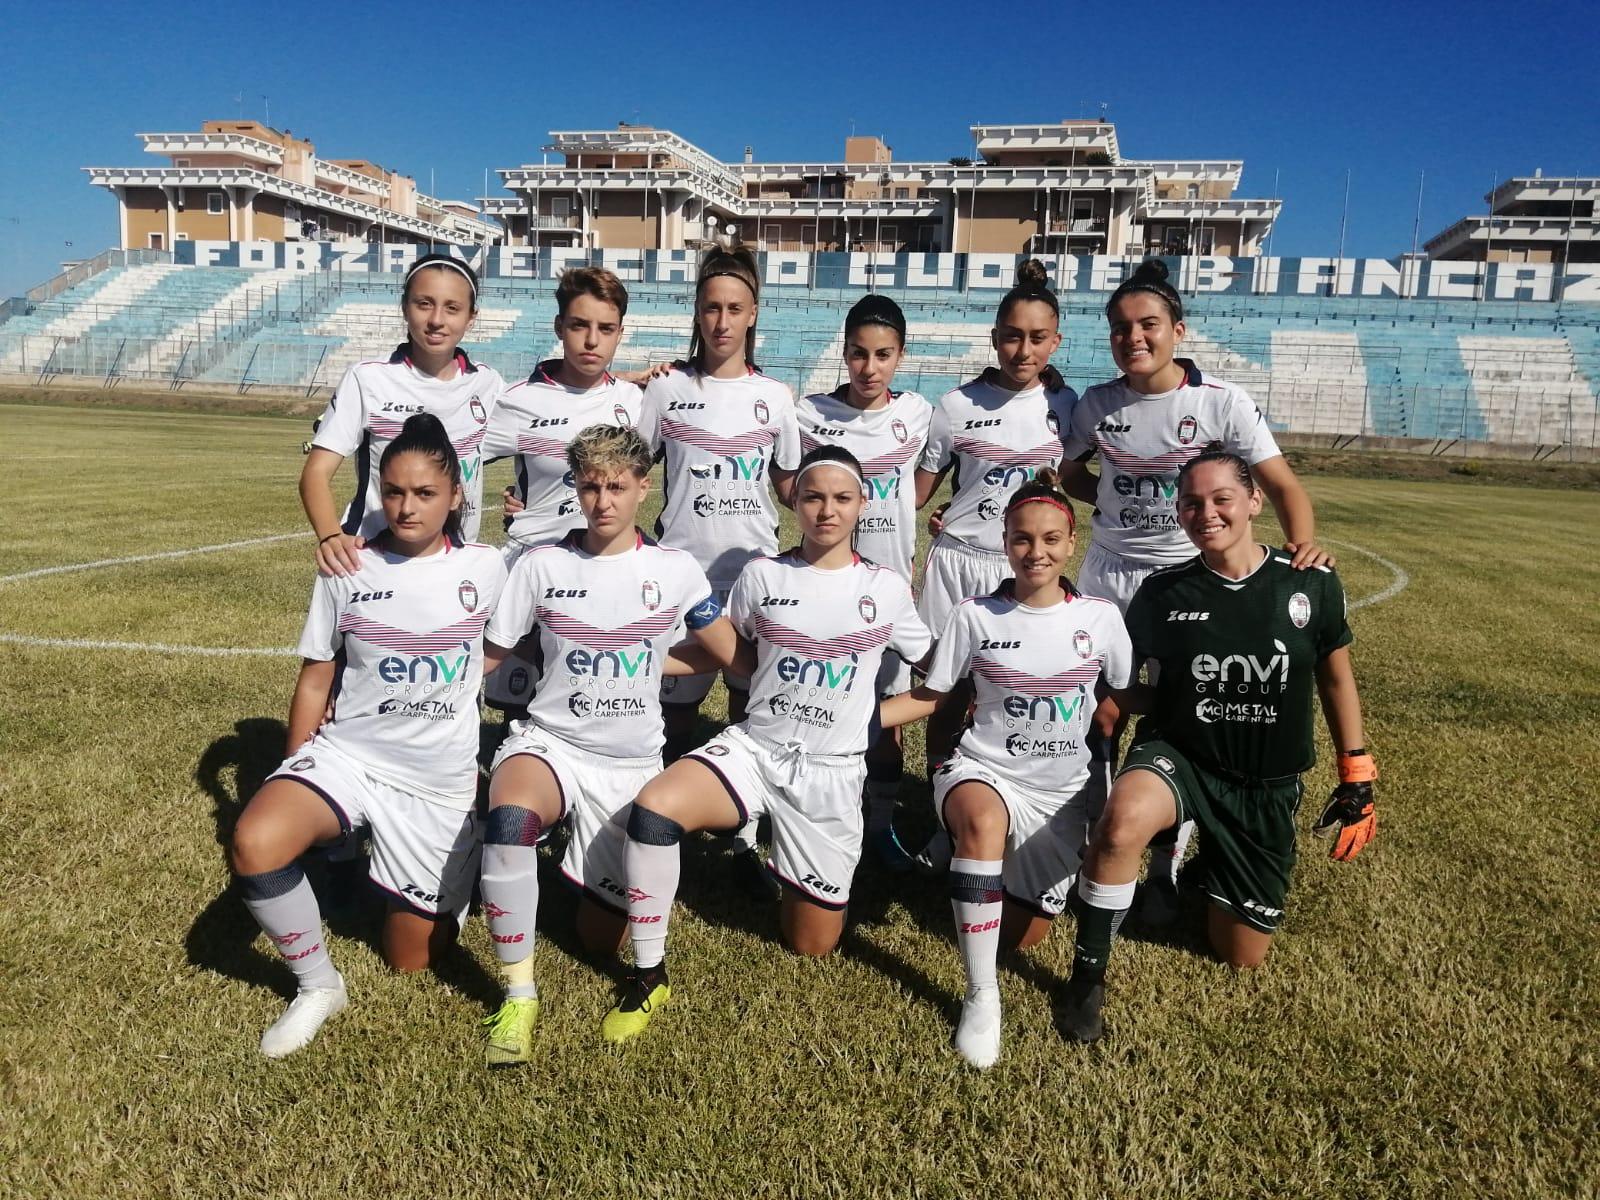 Femminile Serie C, 1ª giornata: Apulia Trani-Crotone 3-0